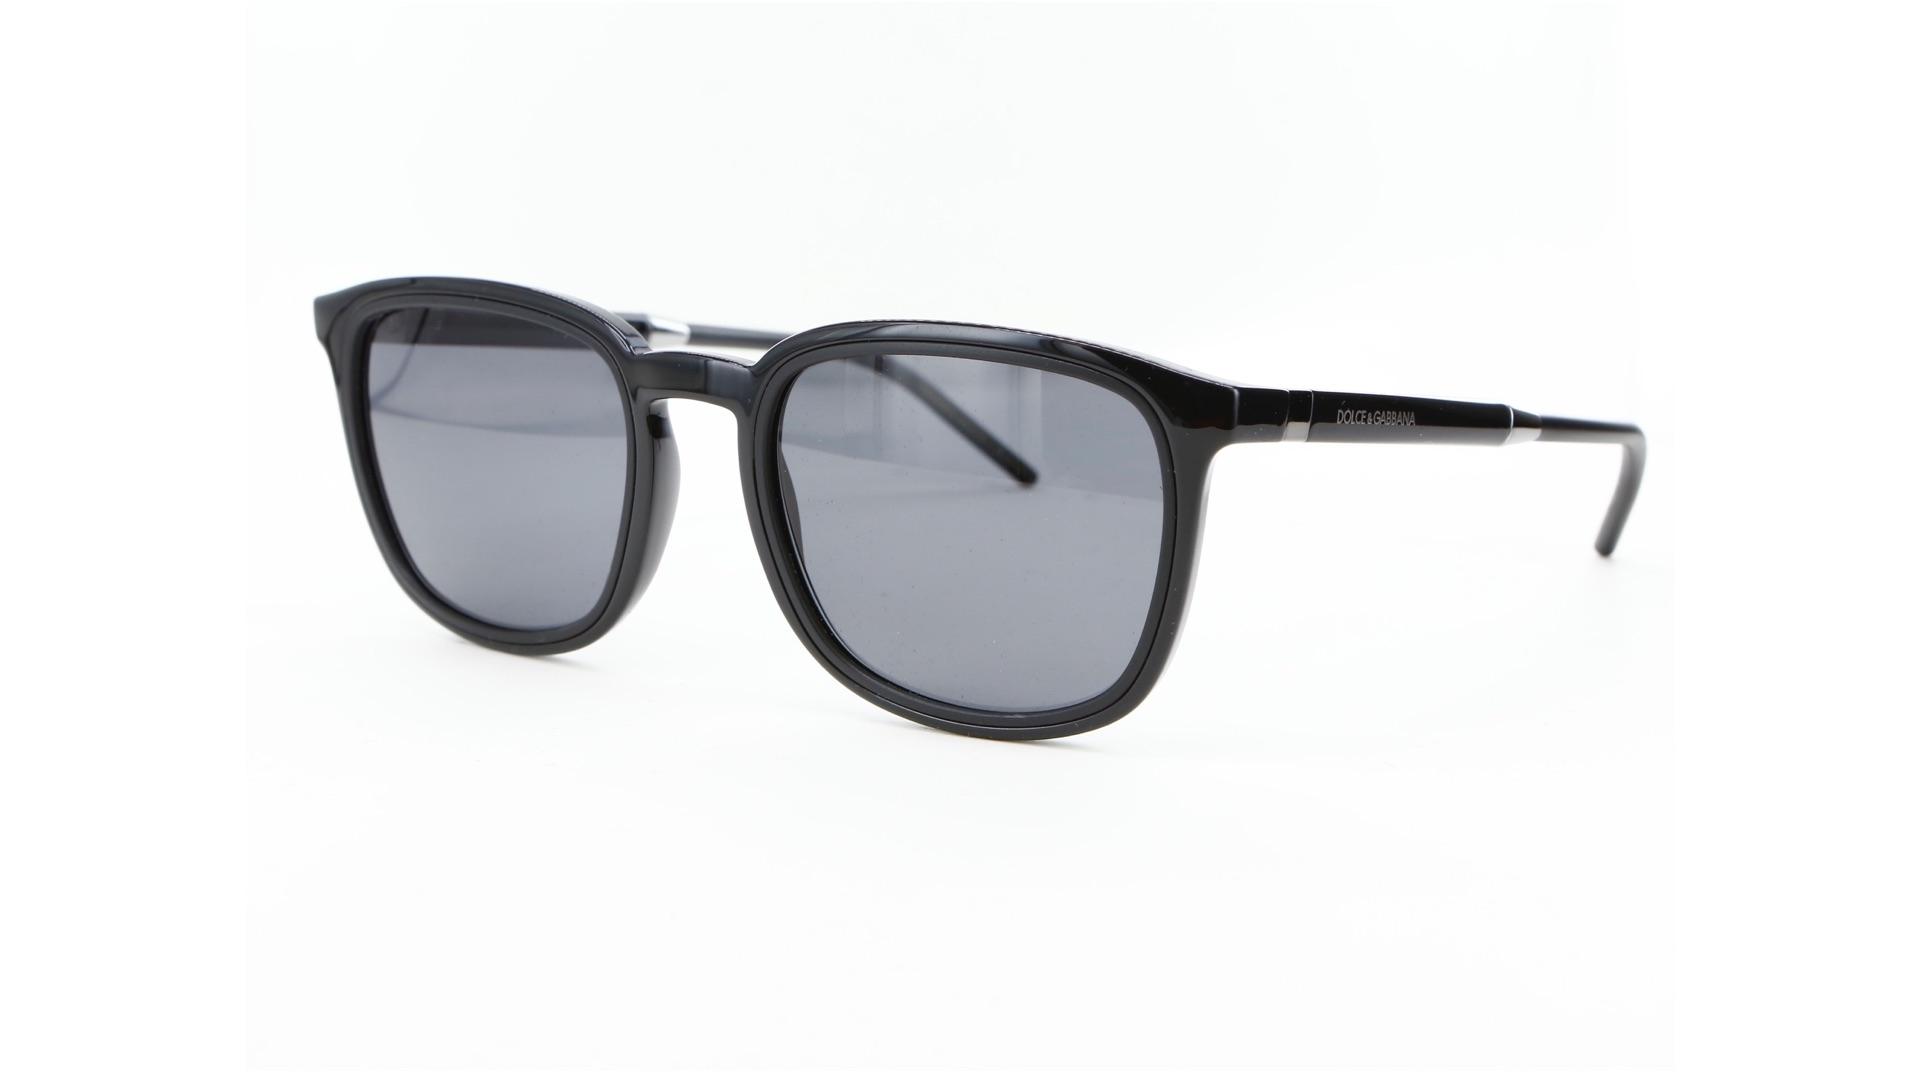 Dolce & Gabbana - ref: 81319